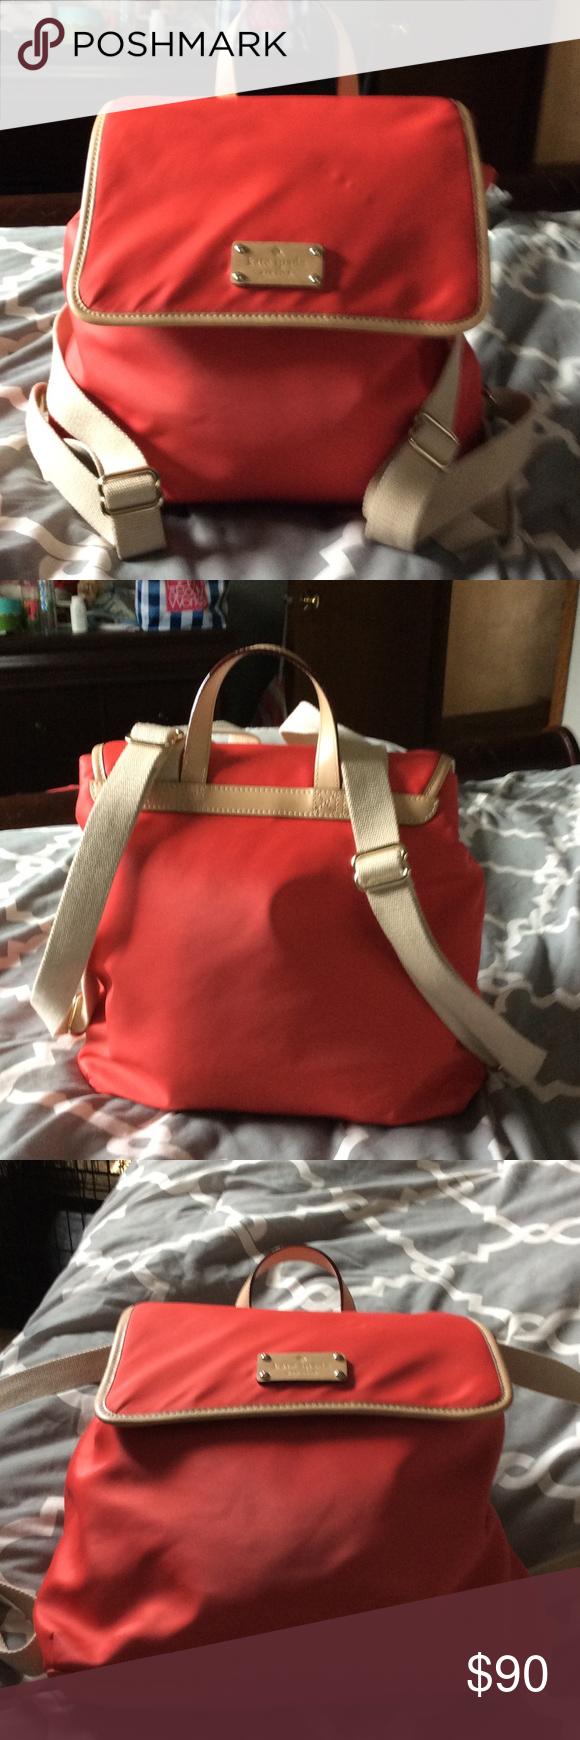 Kate Spade Book Bag Purse